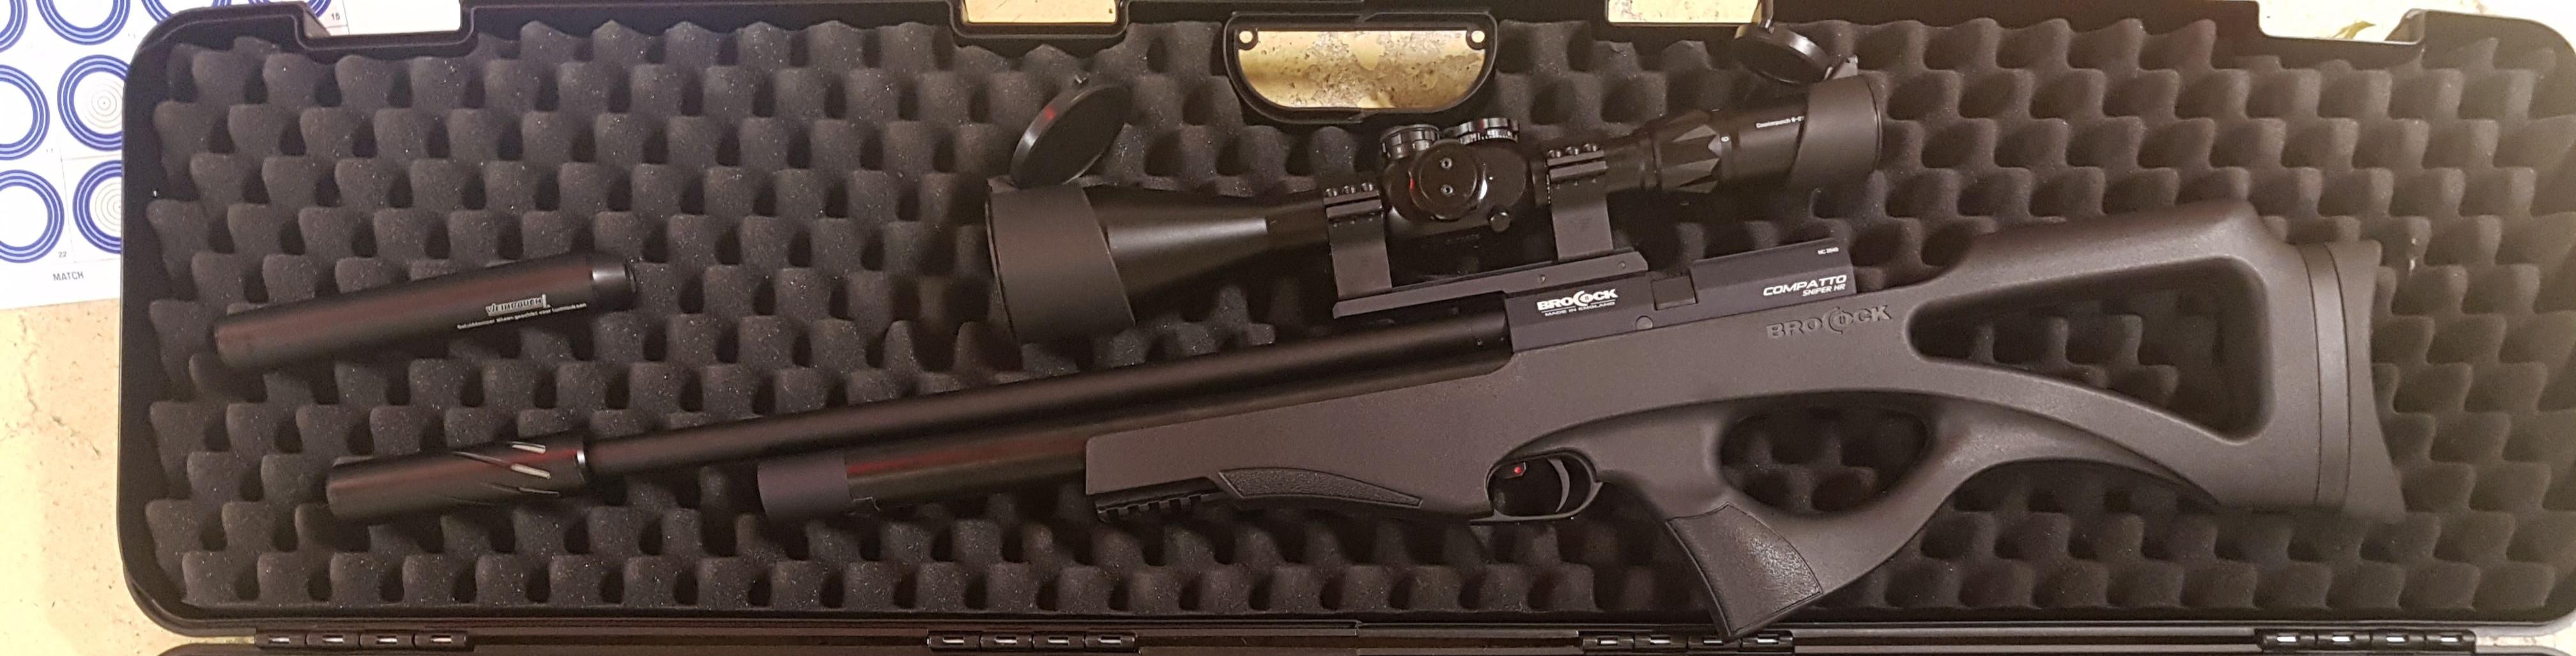 Avis / Conseils / Brocock Bantam Sniper HR HiLite 177 - Page 4 20191211